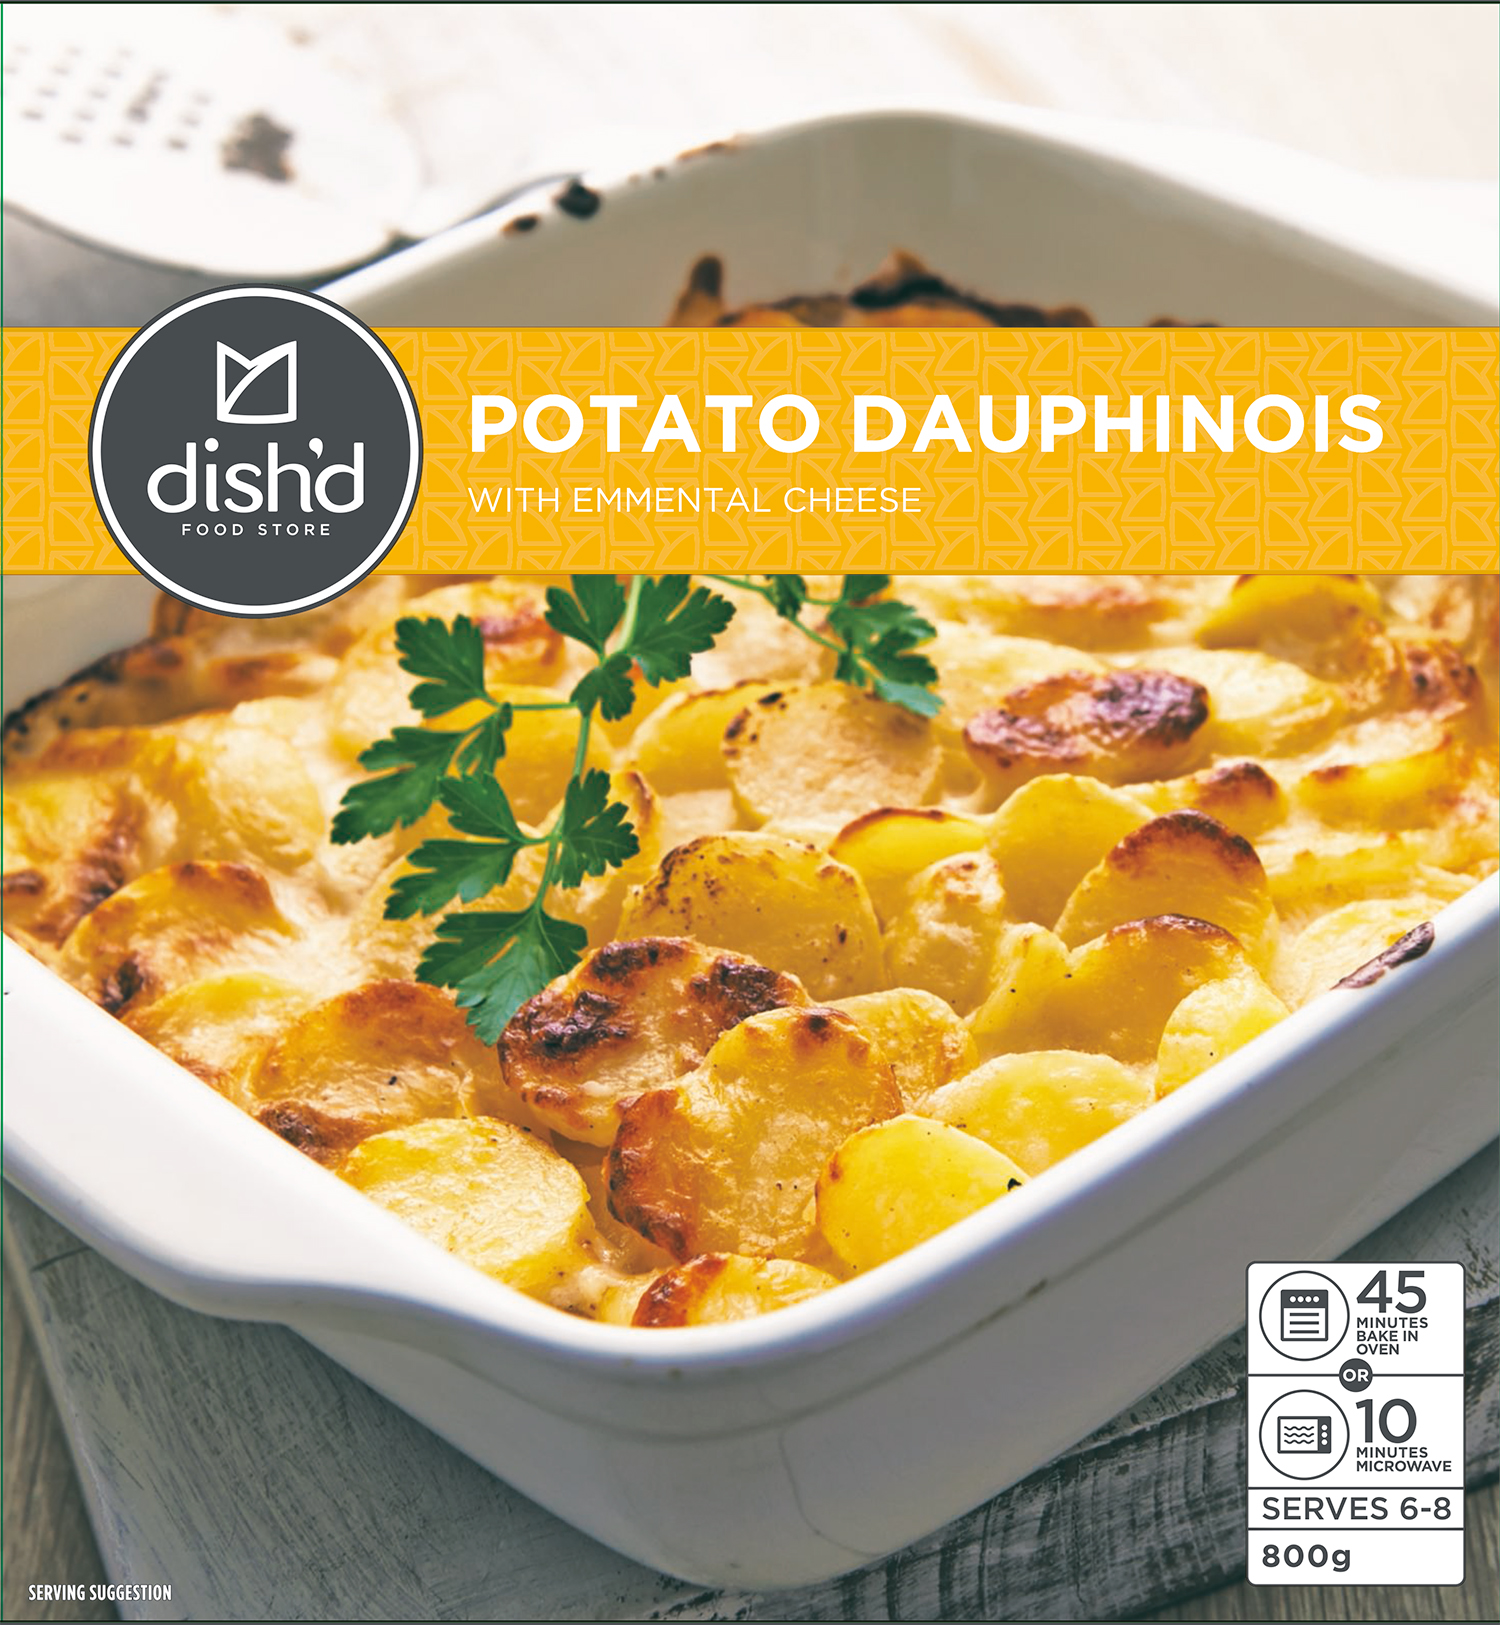 58902 Potato Dauphinois 800g.jpg